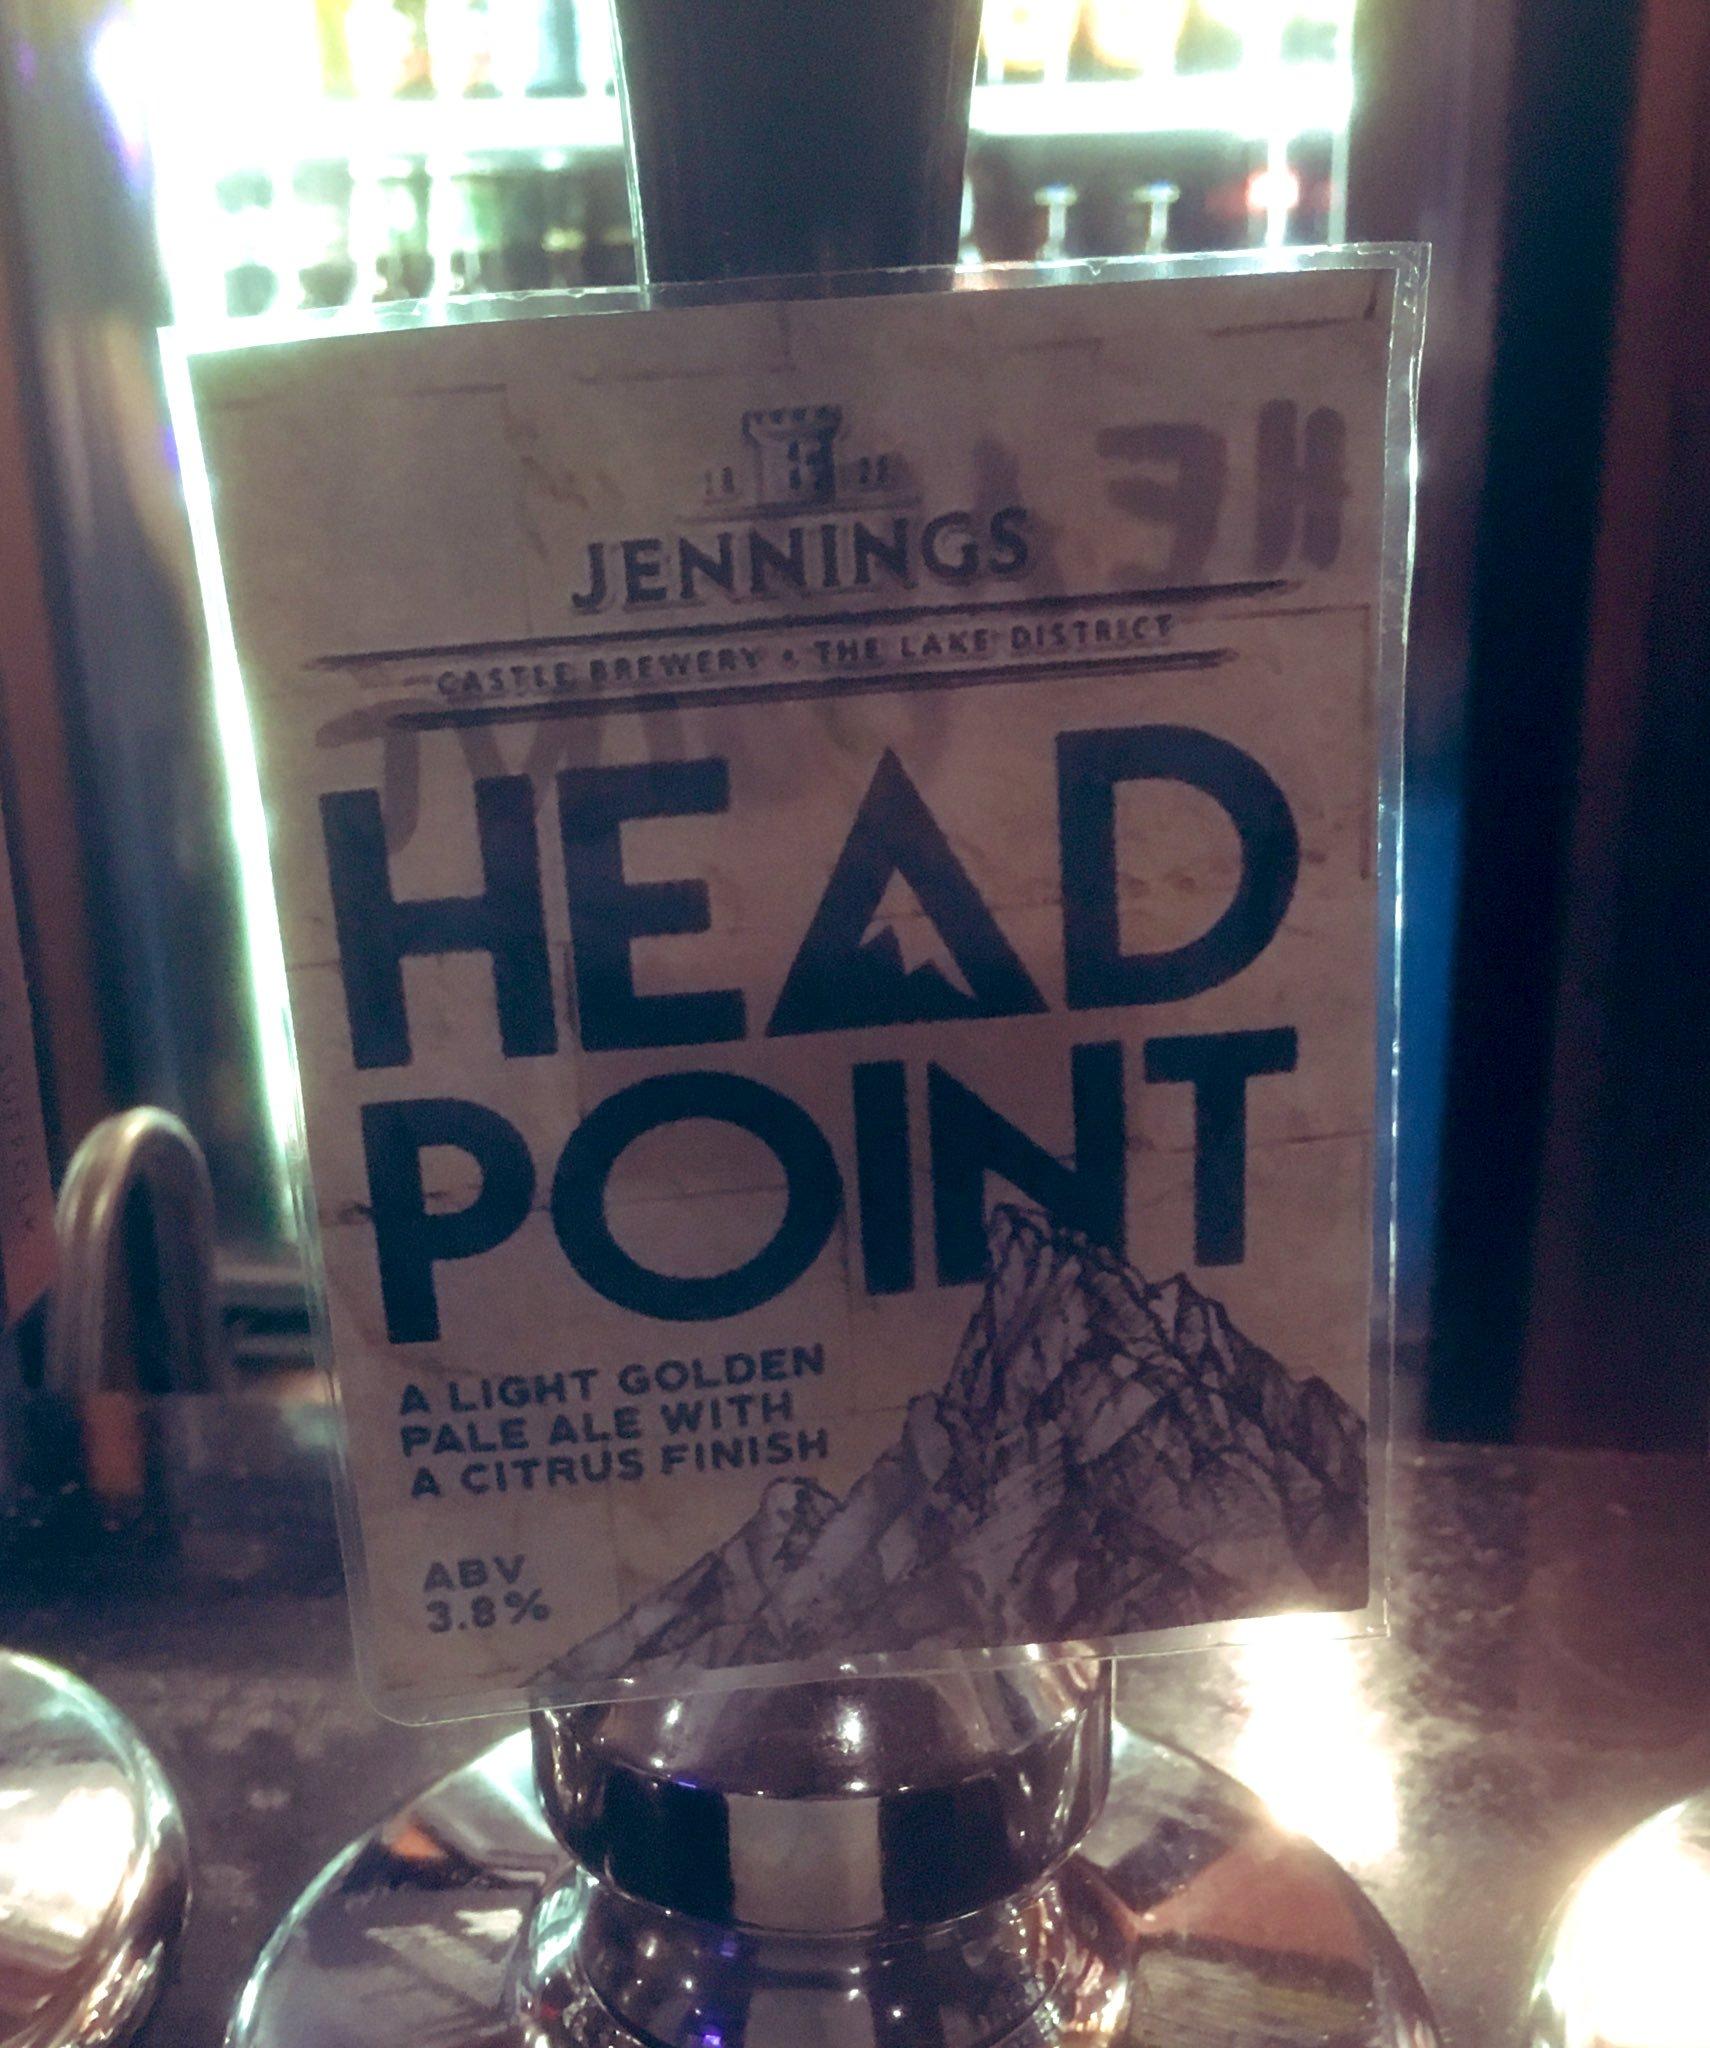 279: Head Point